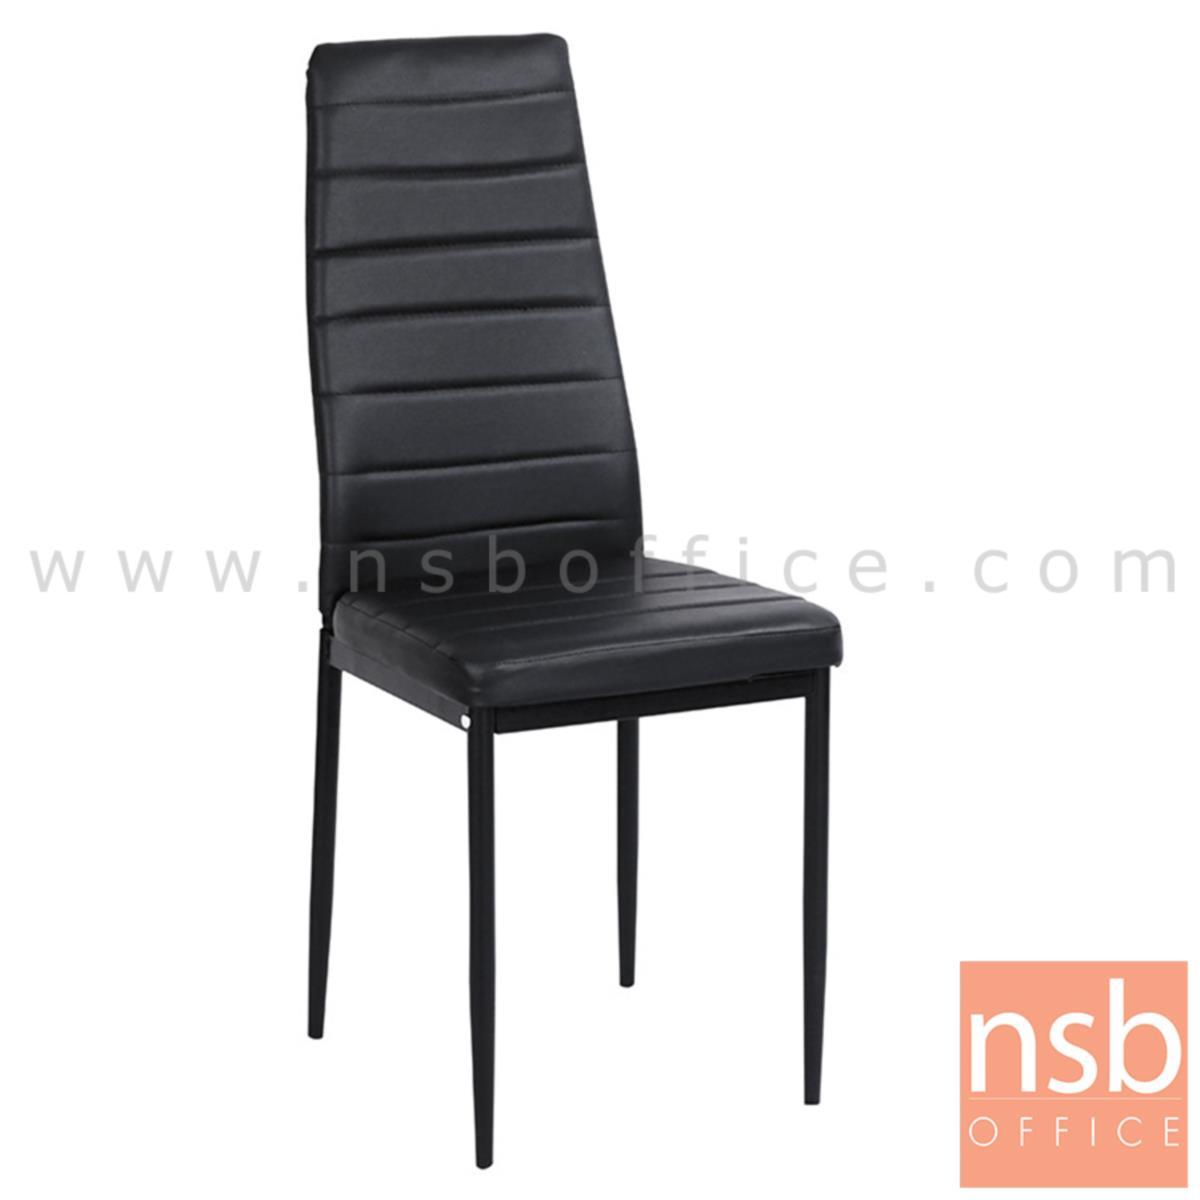 L03A001:เก้าอี้อเนกประสงค์ รุ่น Rollins (โรลลินส์) ขนาด 96H cm. ขาเหล็กพ่นดำ (สต็อก 26 ตัว)